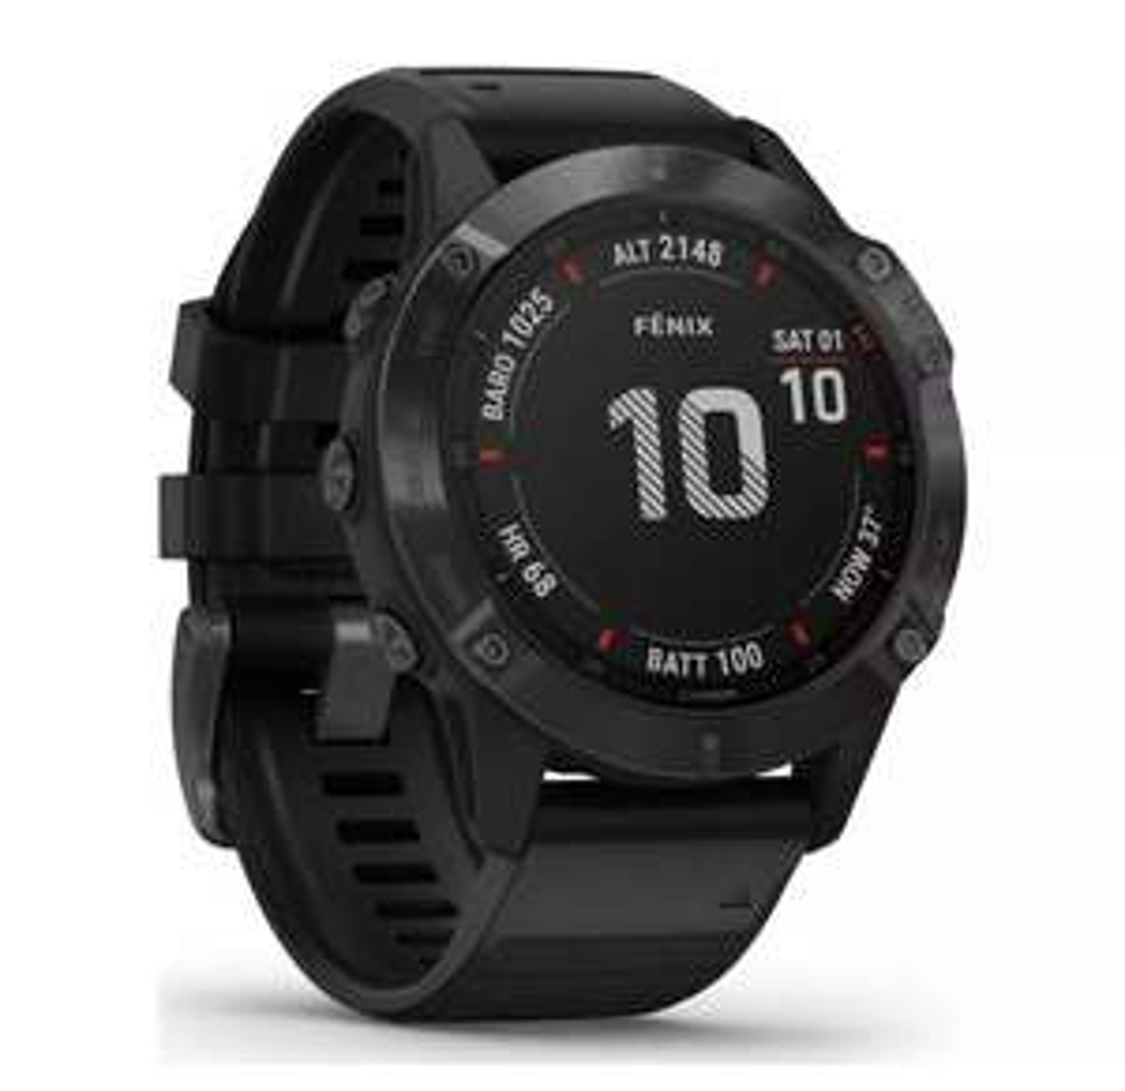 Garmin Fenix 6 Pro Watch - £494.10 (With Code) @ eBay / Currys PC World